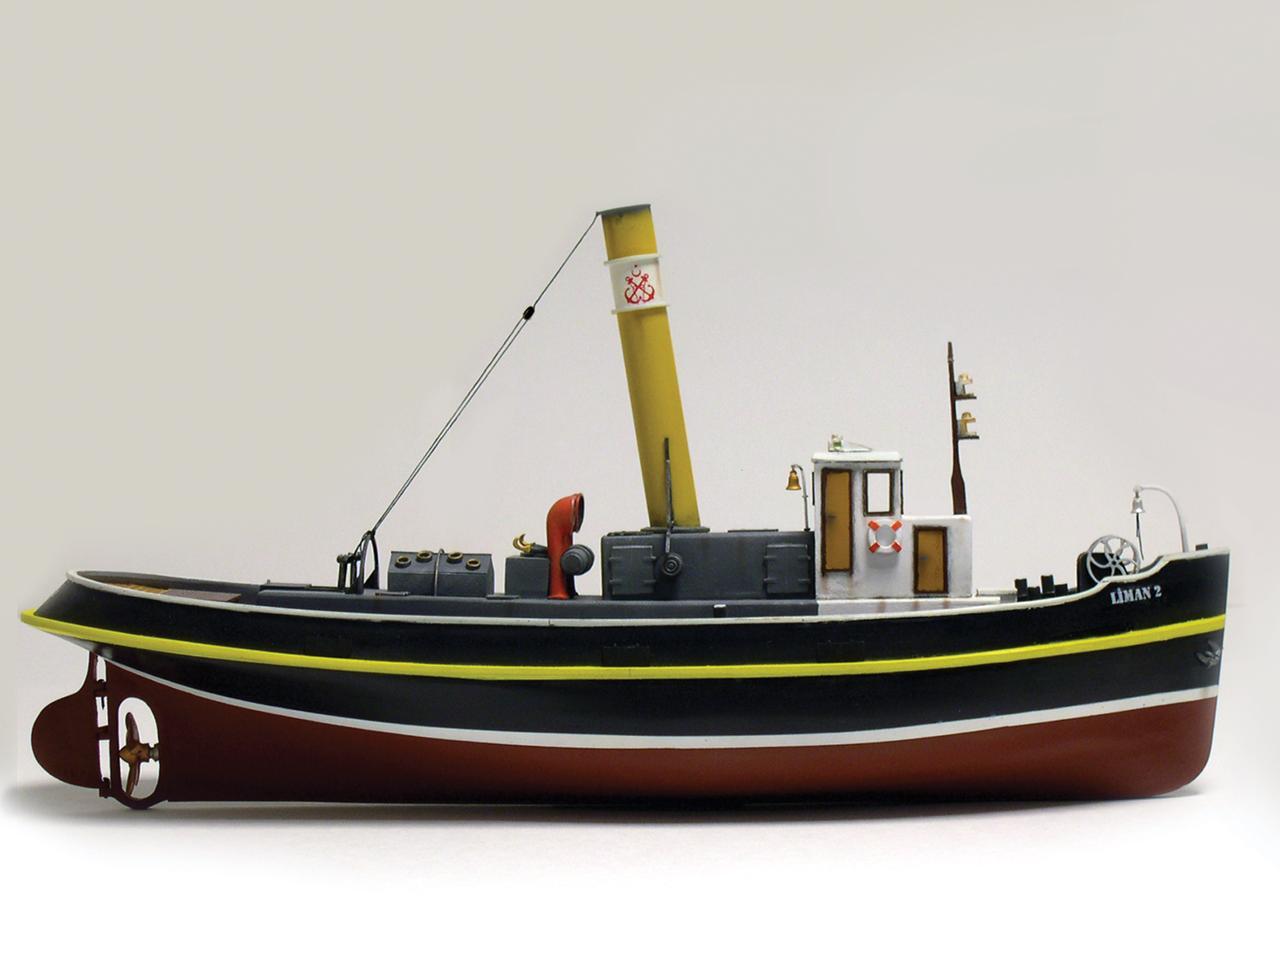 Boat Kits Product : Liman wooden model ship kit buy